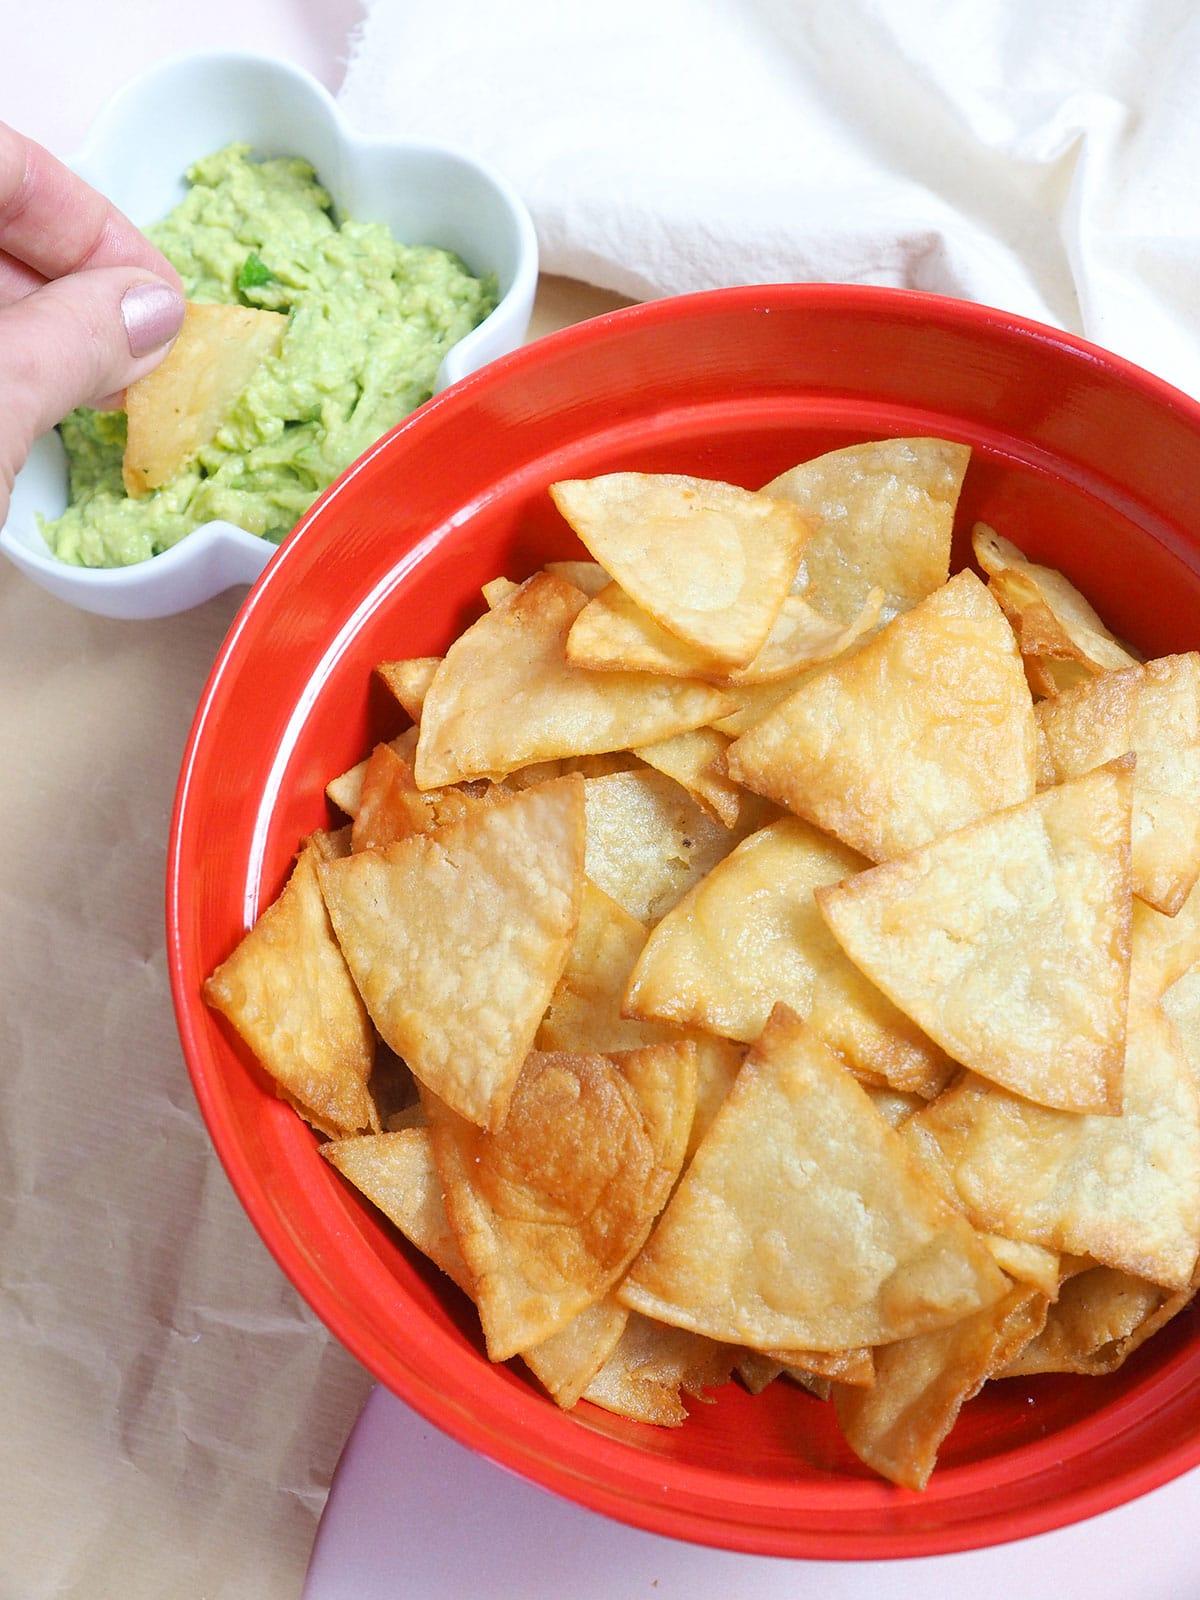 Red bowl full of homemade tortilla chips.